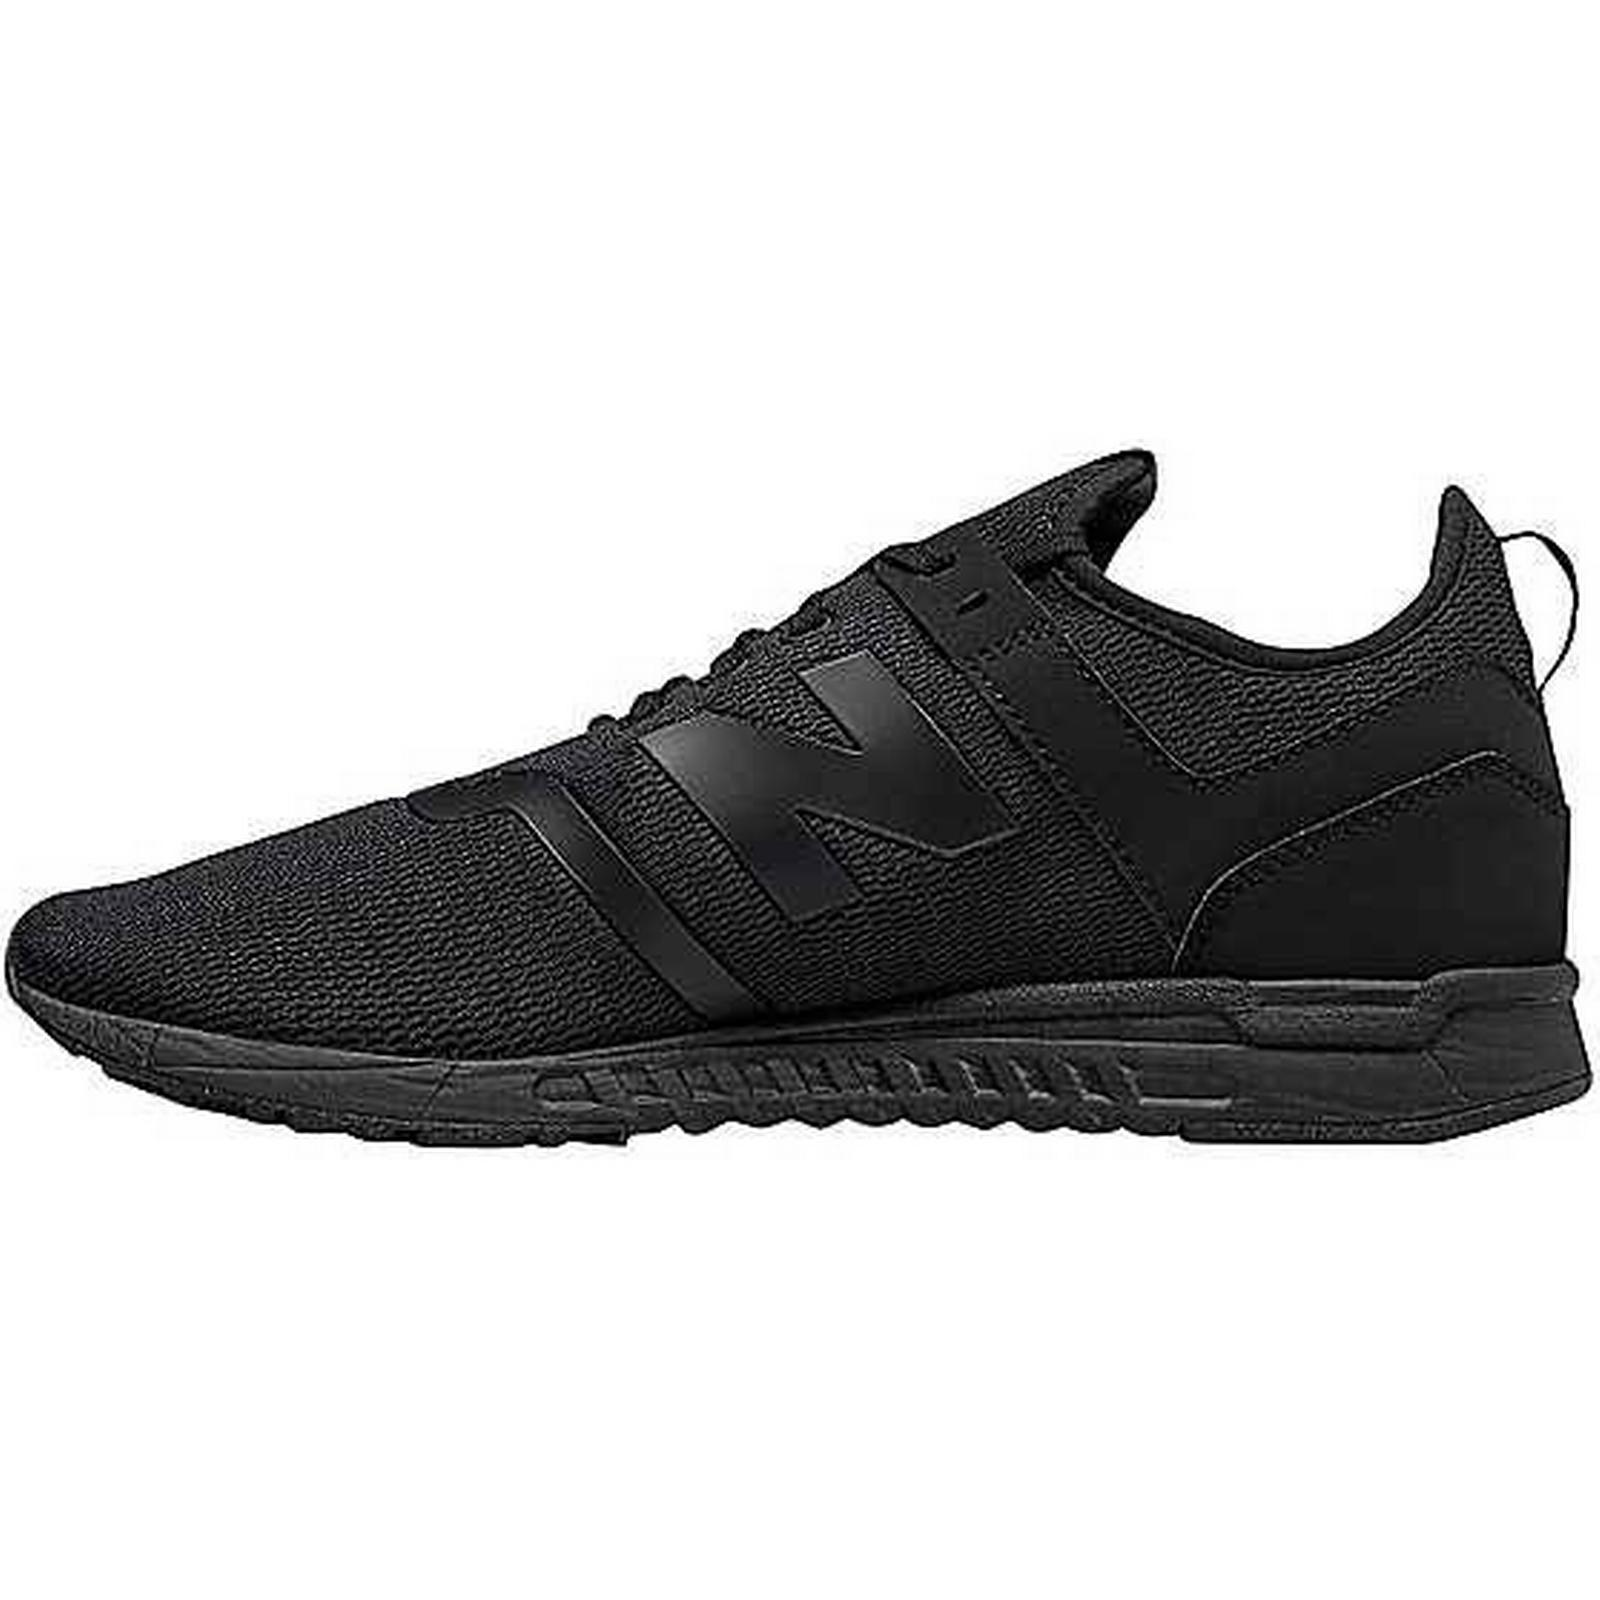 New Balance Sneakers New by New Sneakers Balance:Gentlemen/Ladies:Online Sale 042601